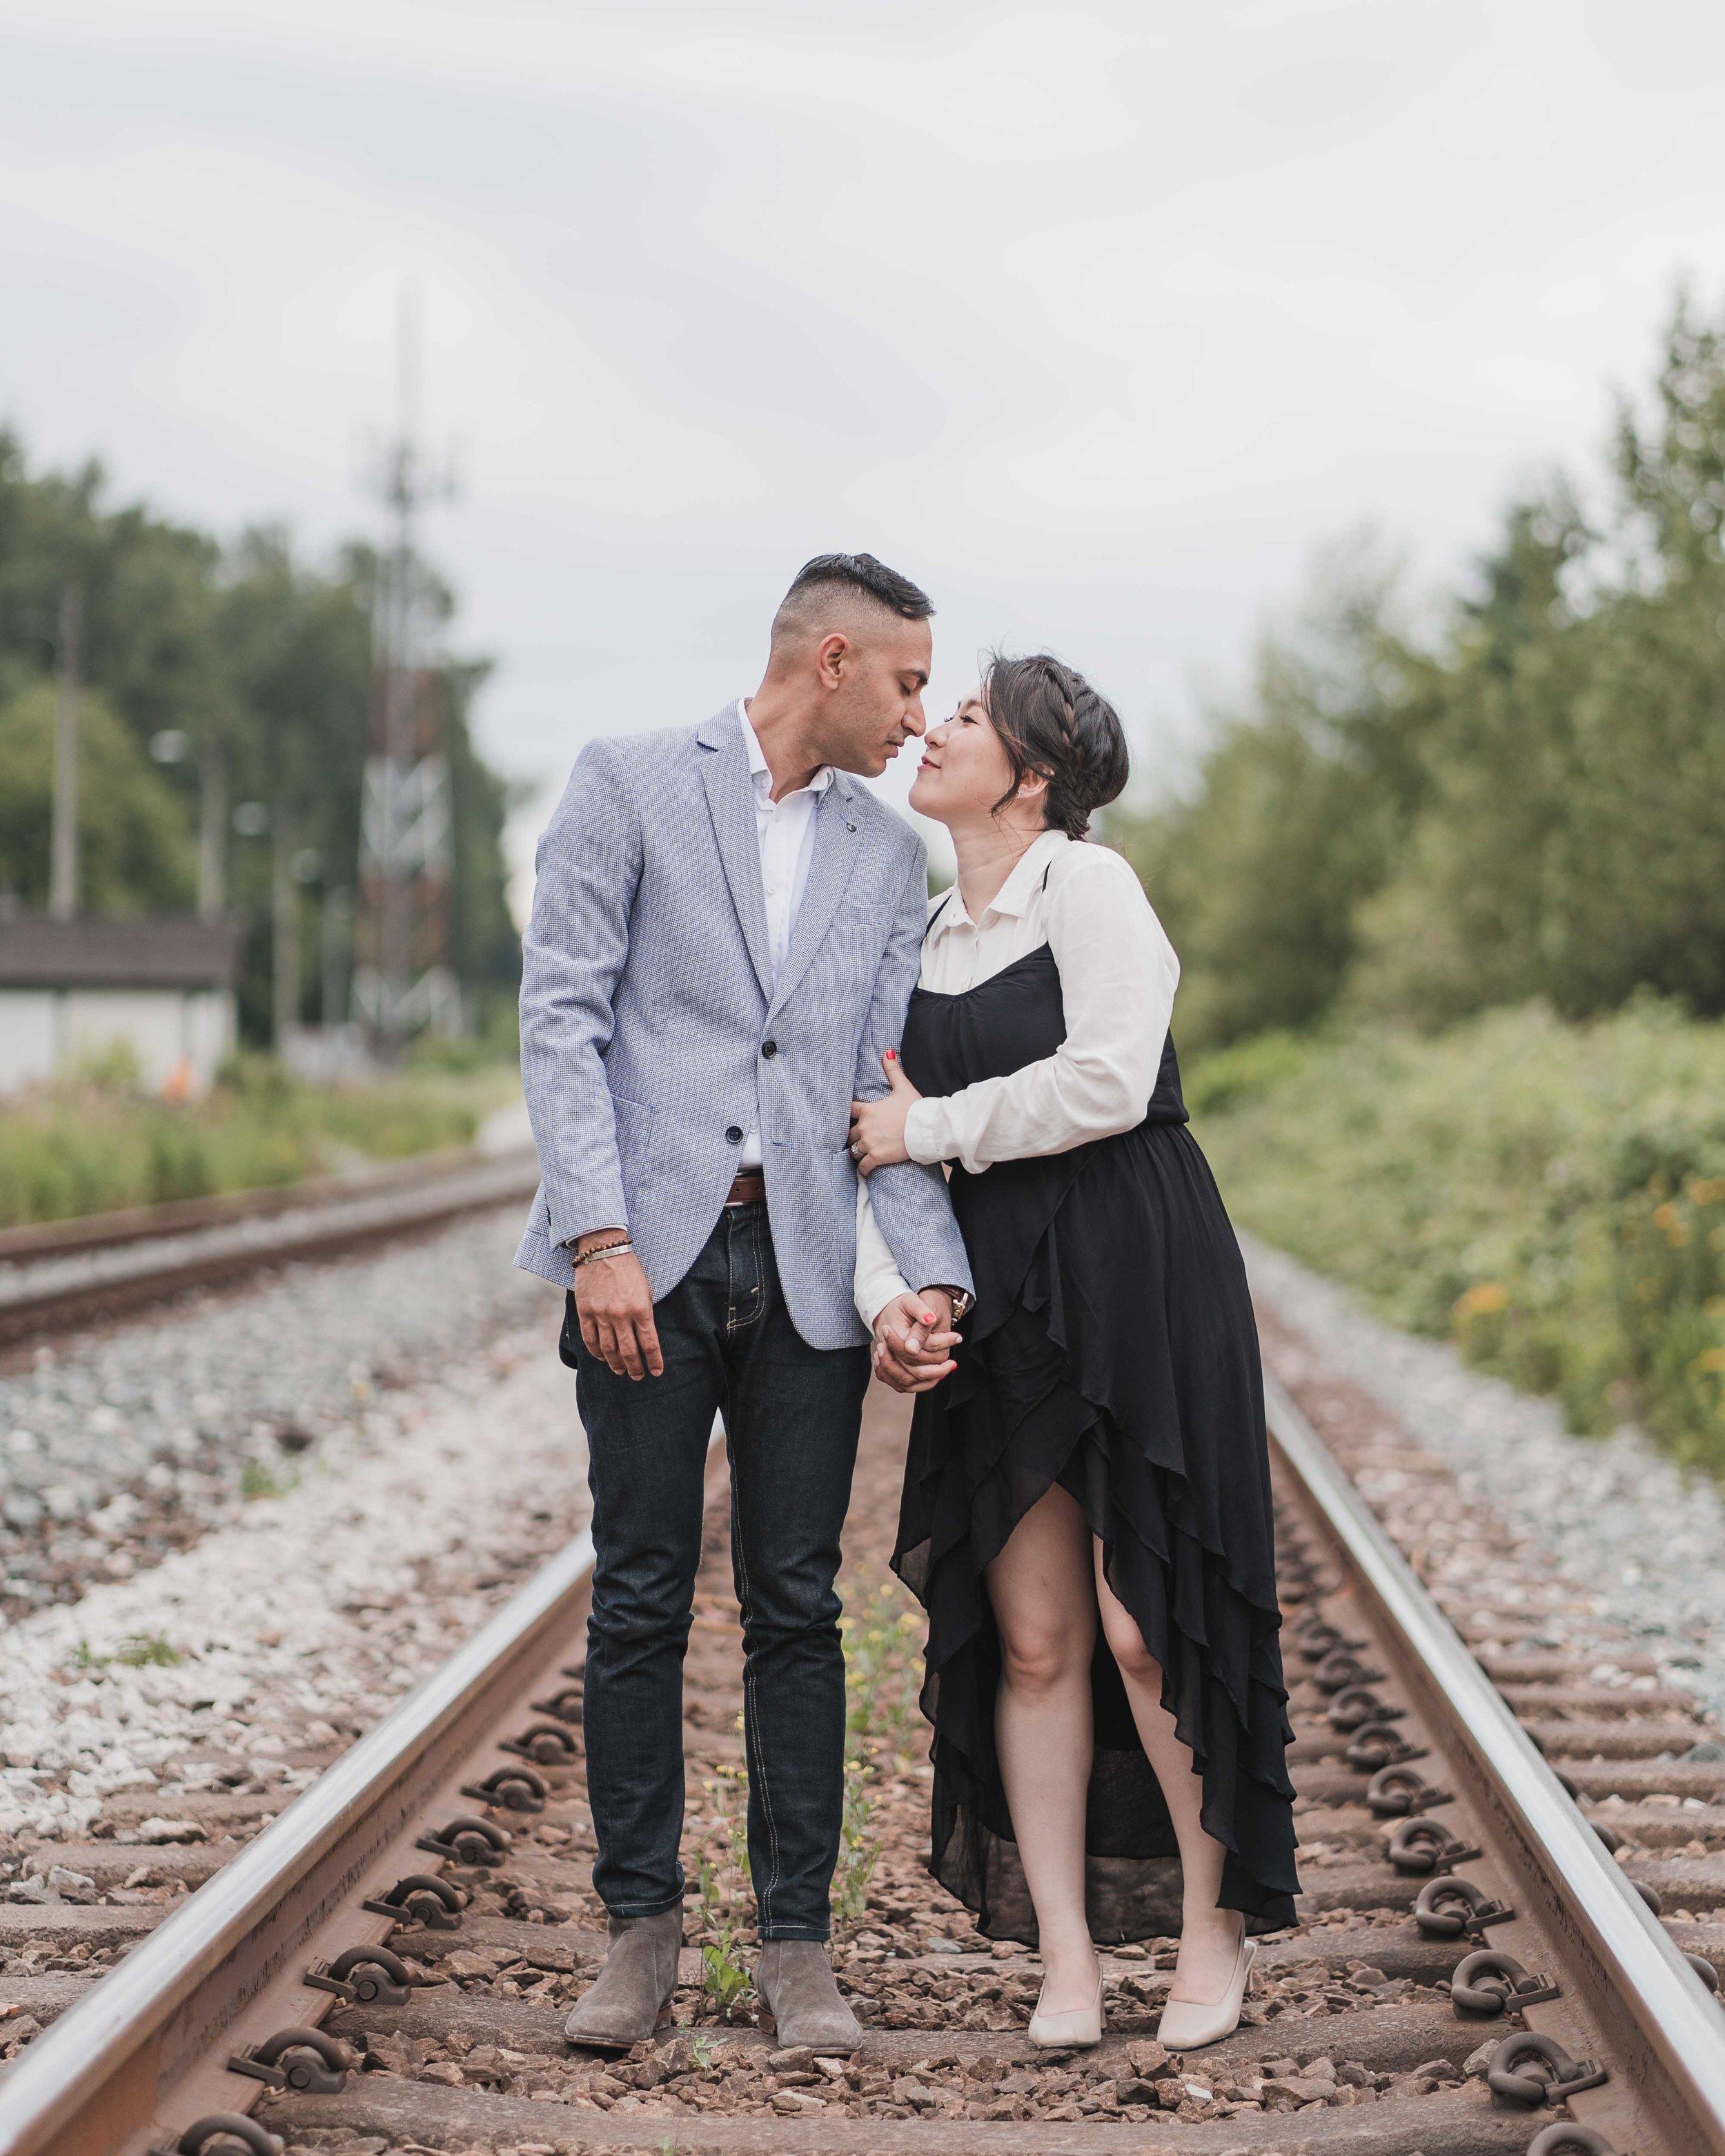 20190622 - Monika & Johnson Engagement - 0199.jpg